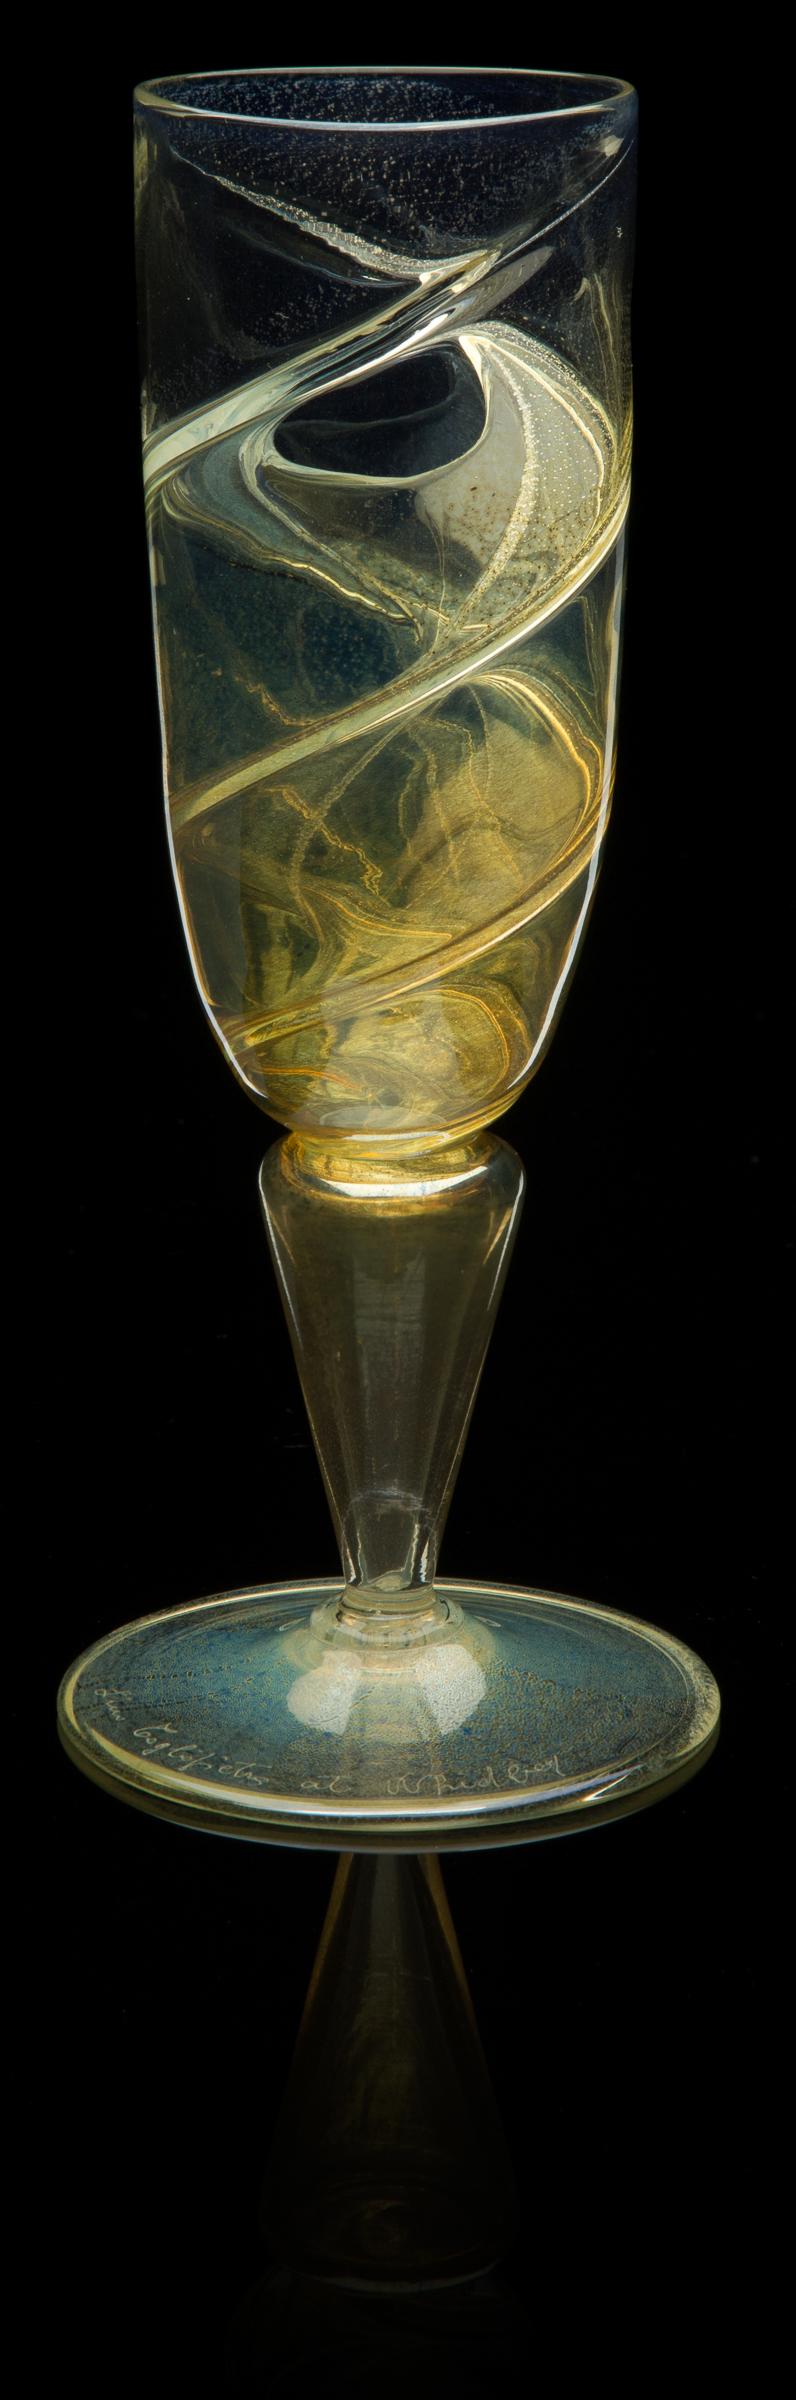 Lino Tagliapietra, Goblet (1991-1994, glass, 8 x 3 1/4 x 3 1/4inches), LT.81